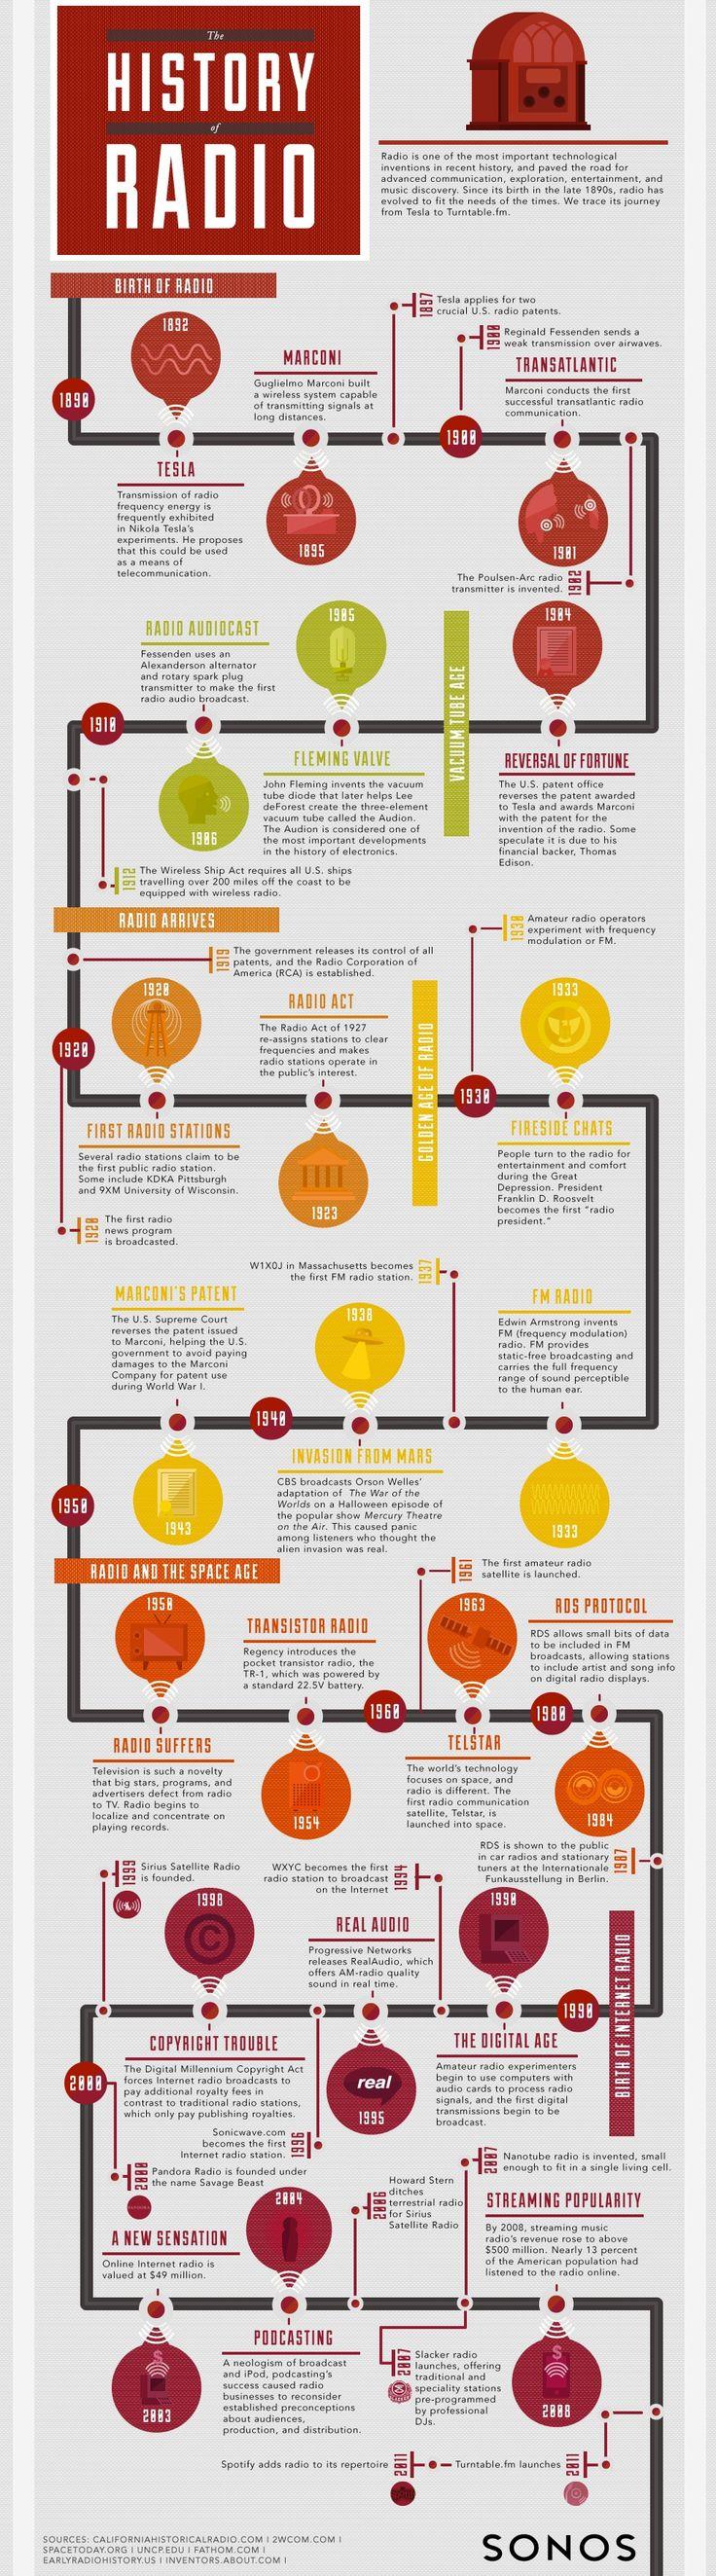 The history of radio #infographic